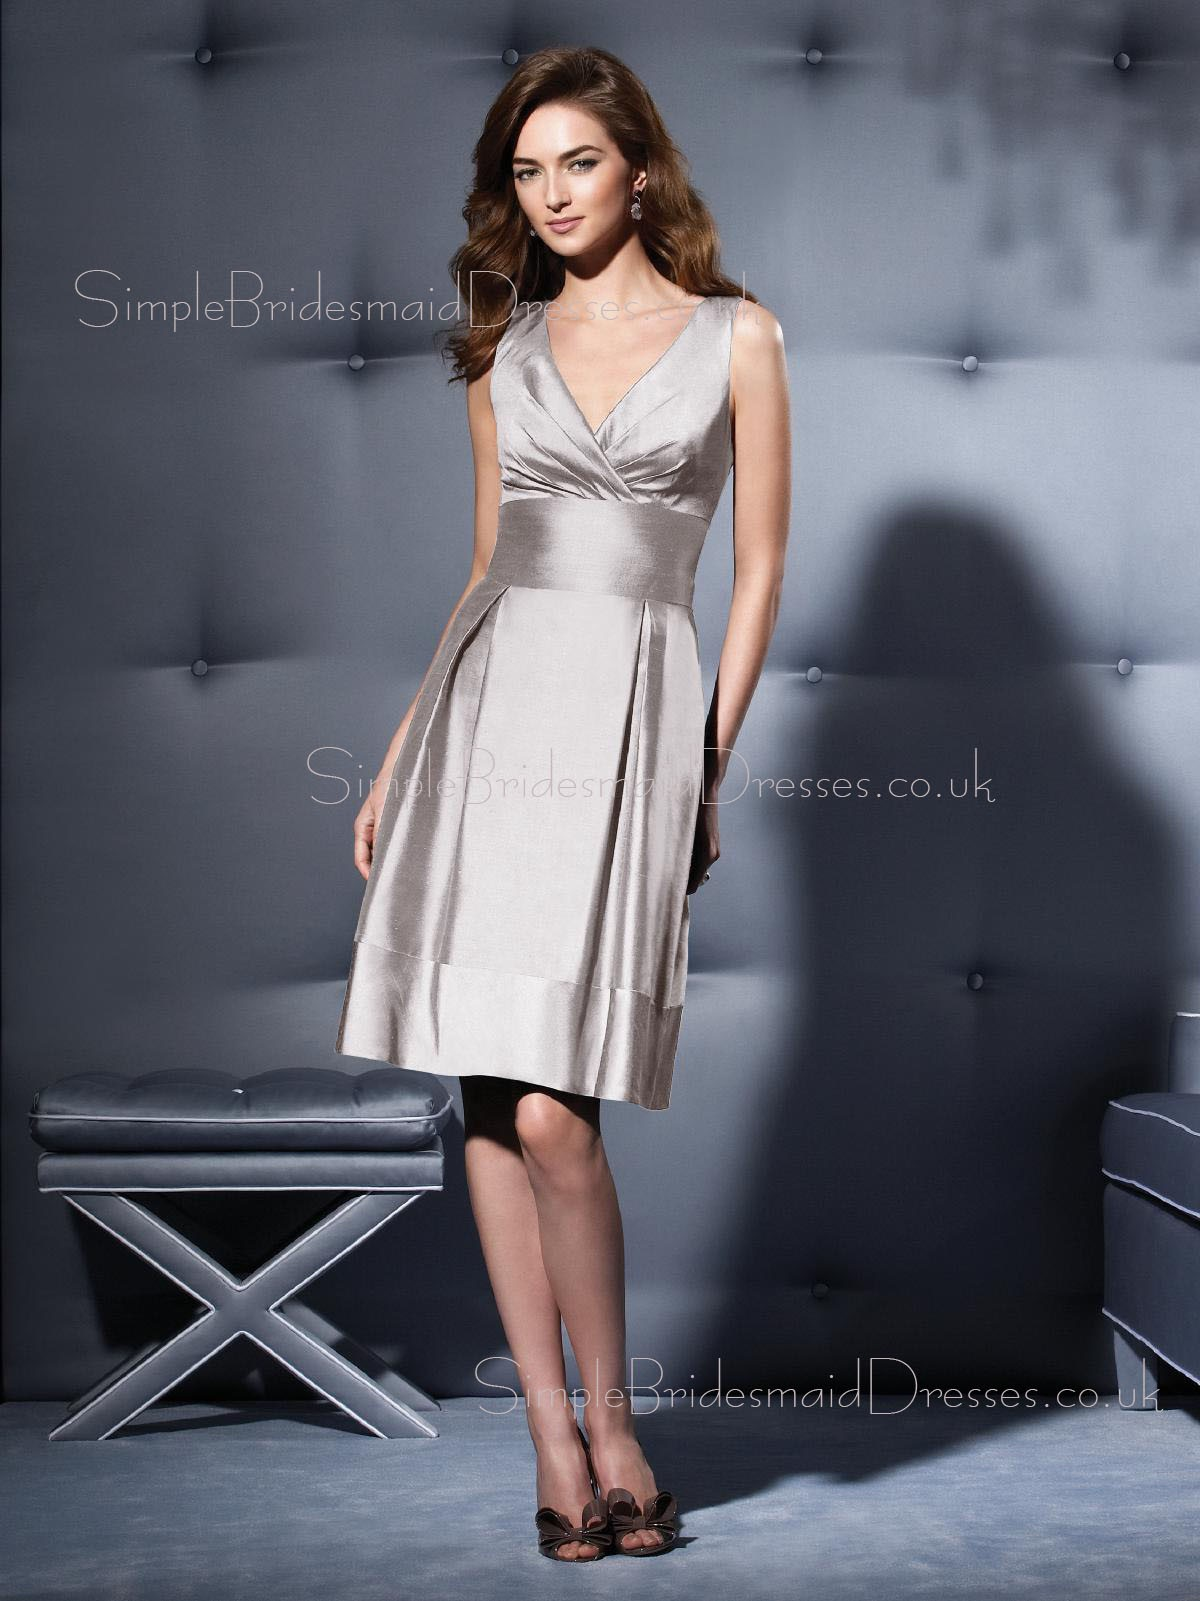 Silver bridesmaid dresses uk cheap silver bridesmaid dresses empire zipper knee length taffeta silver bridesmaid dress ombrellifo Choice Image